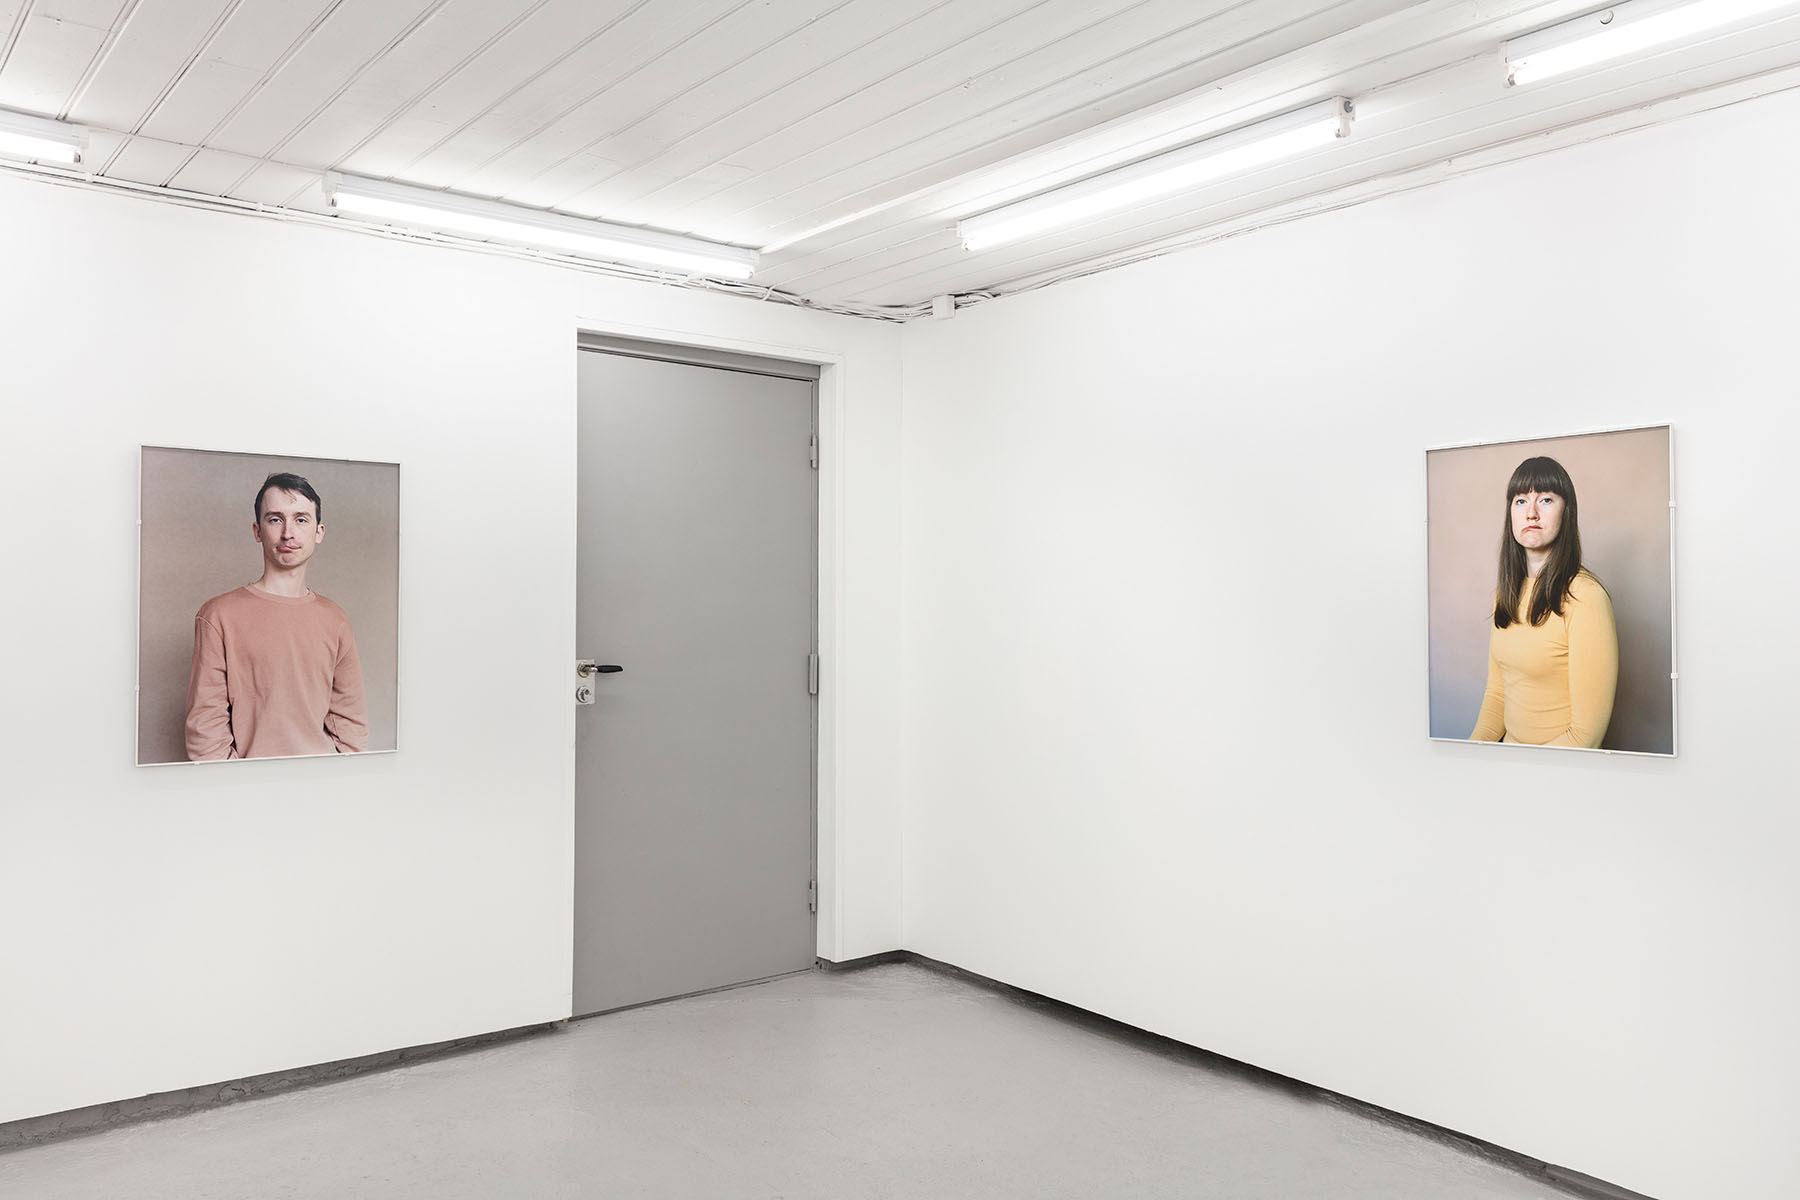 Ingrid Eggen - KNAX at MELK 2017